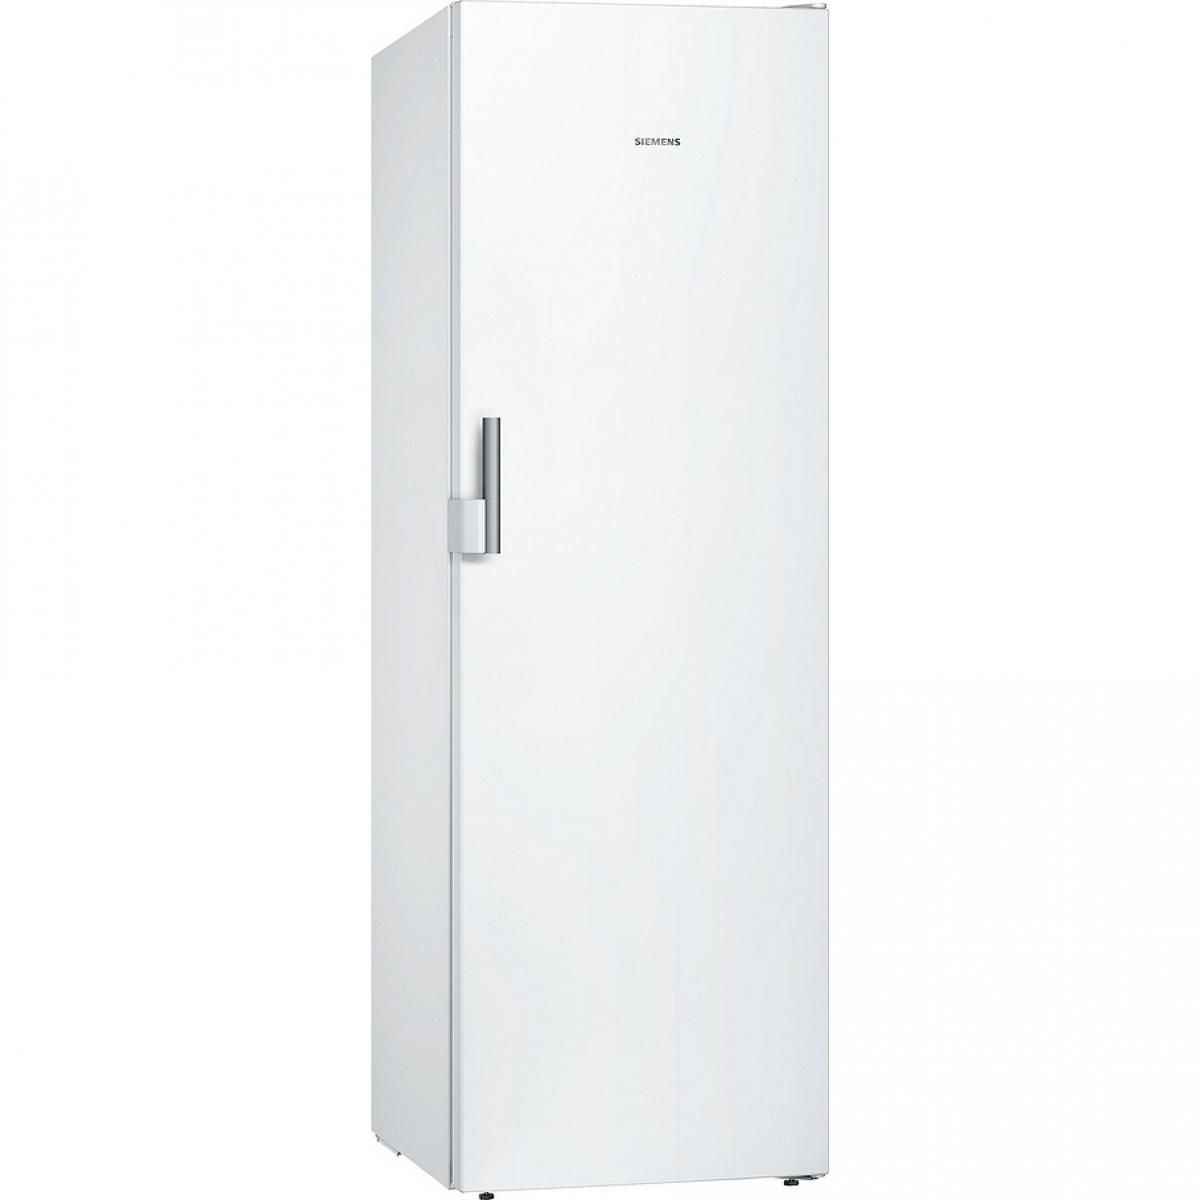 Siemens Congélateur armoire SIEMENS, GS36NCWEV